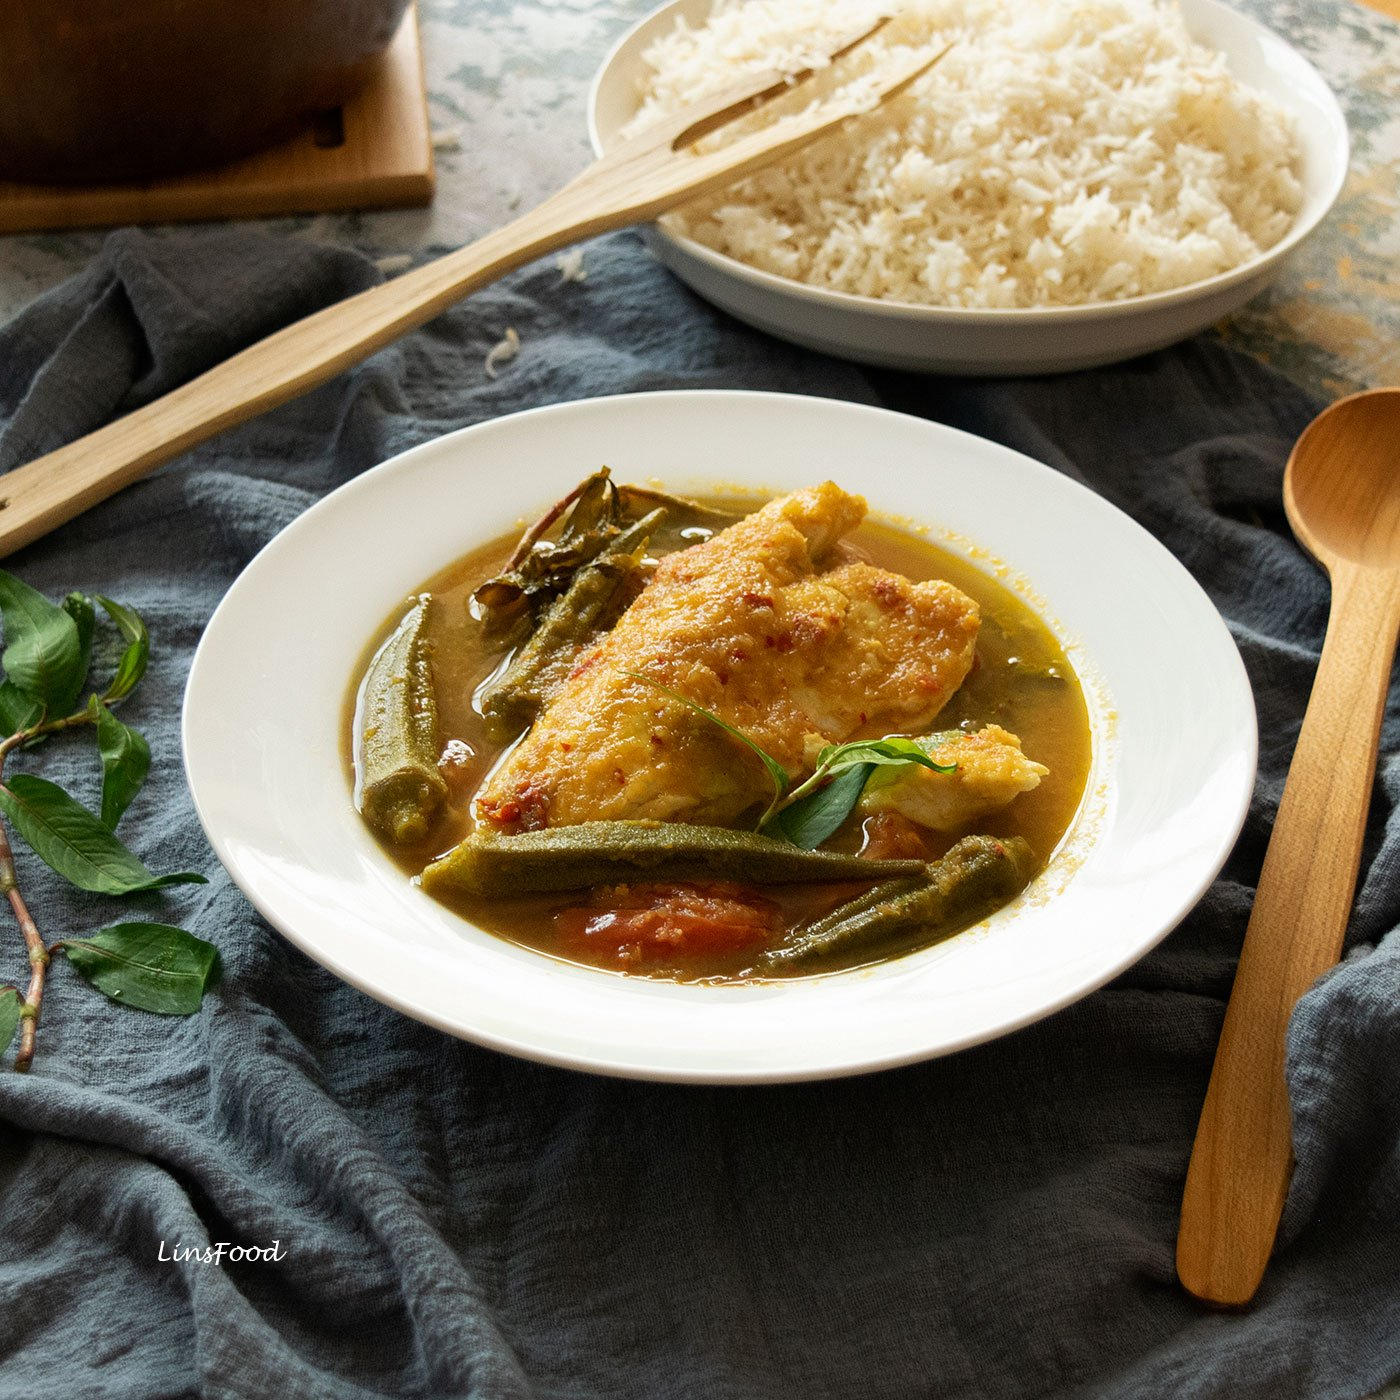 Ikan asam pedas, fish curry